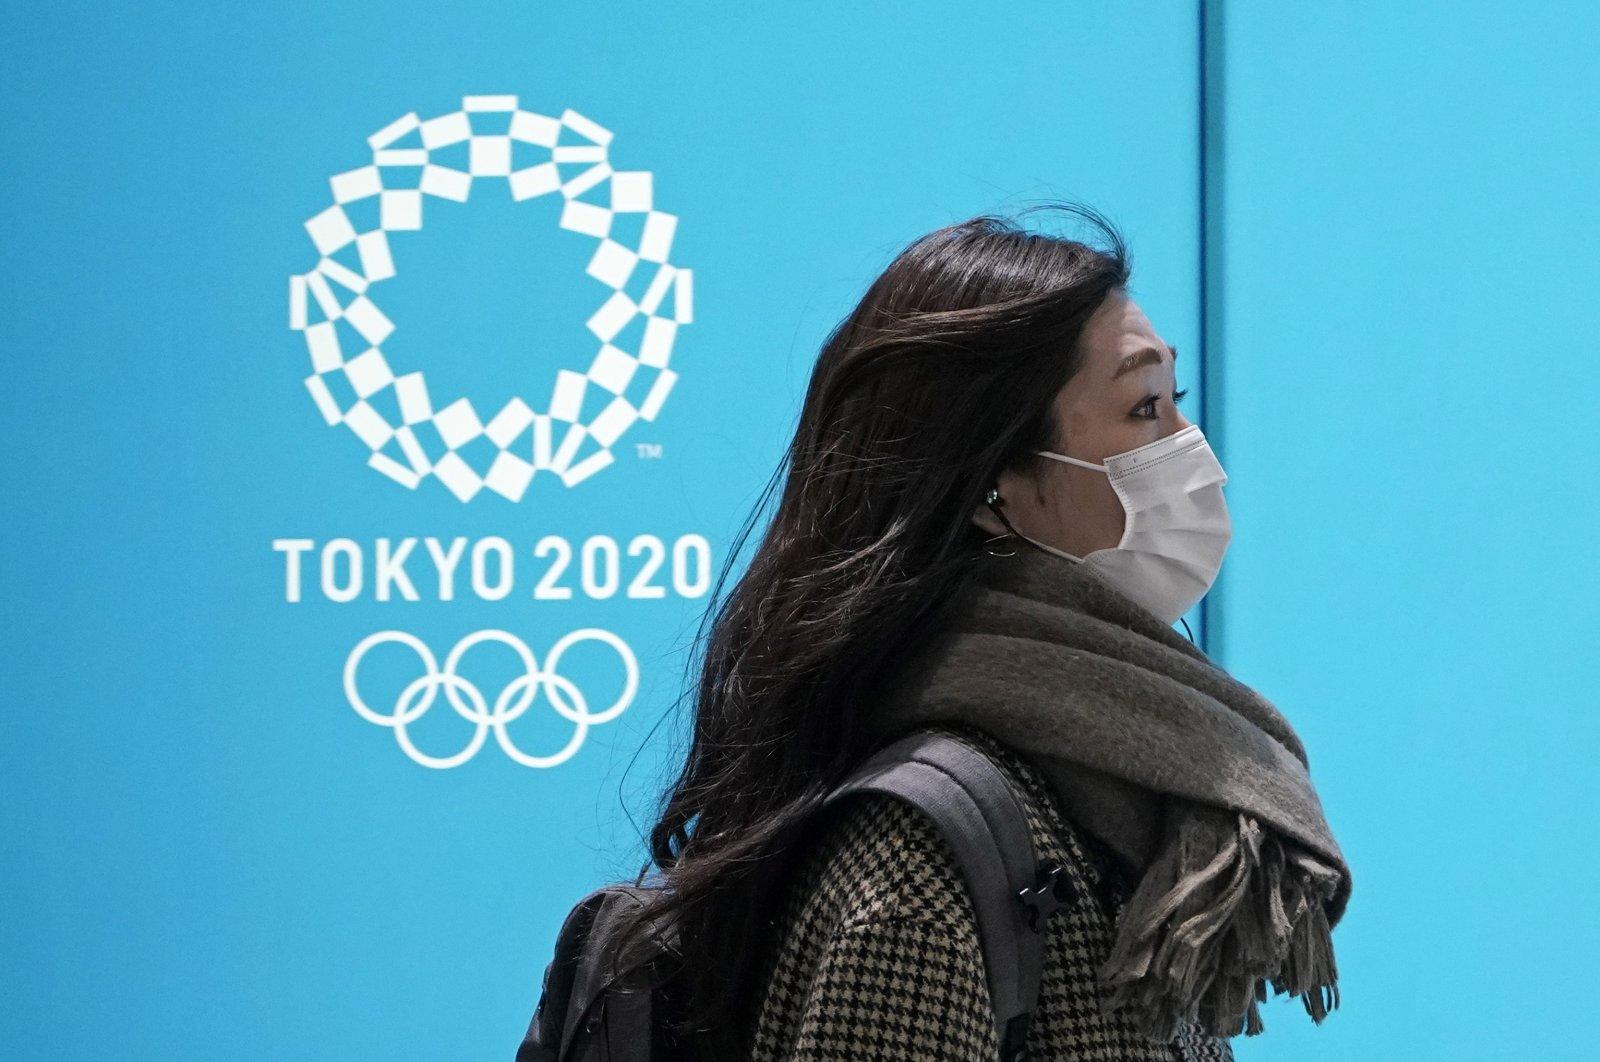 A woman walks past a postponed Tokyo Olympic Games advertising board in Tokyo, Japan, Jan. 27, 2021. (EPA Photo)